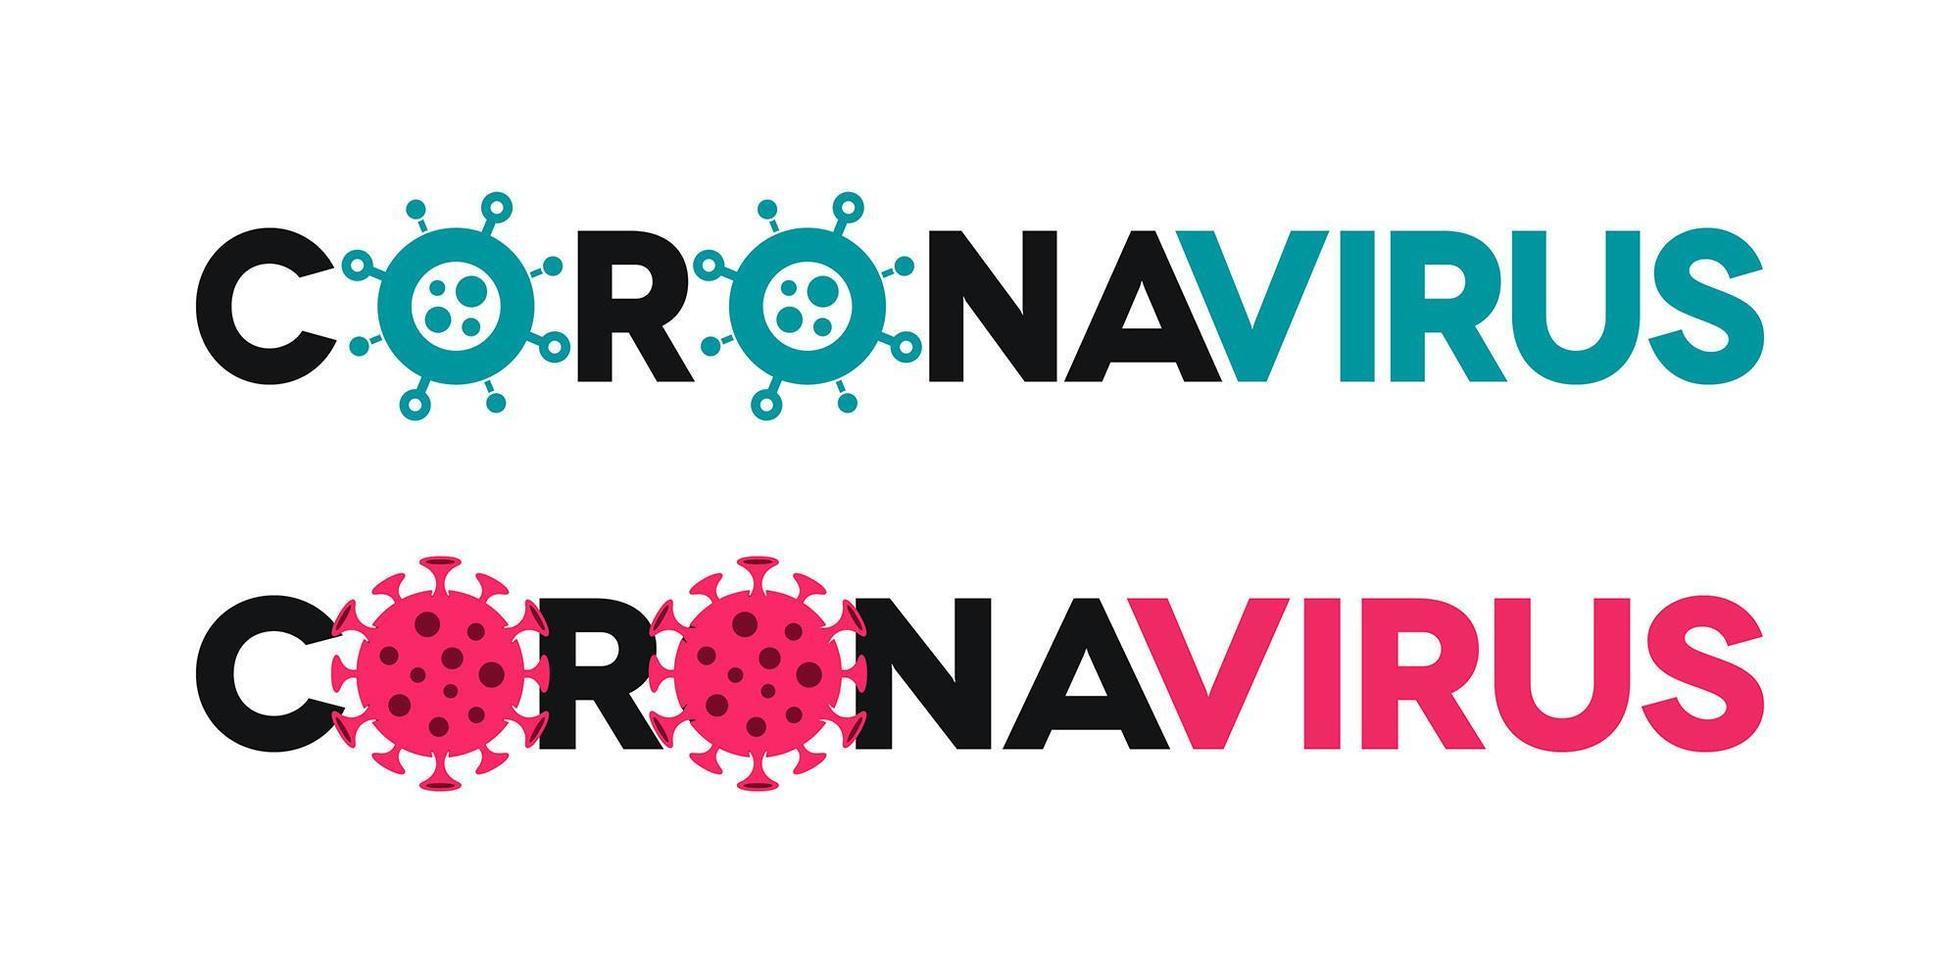 Coronavirus Lettering with Virus Icons vector